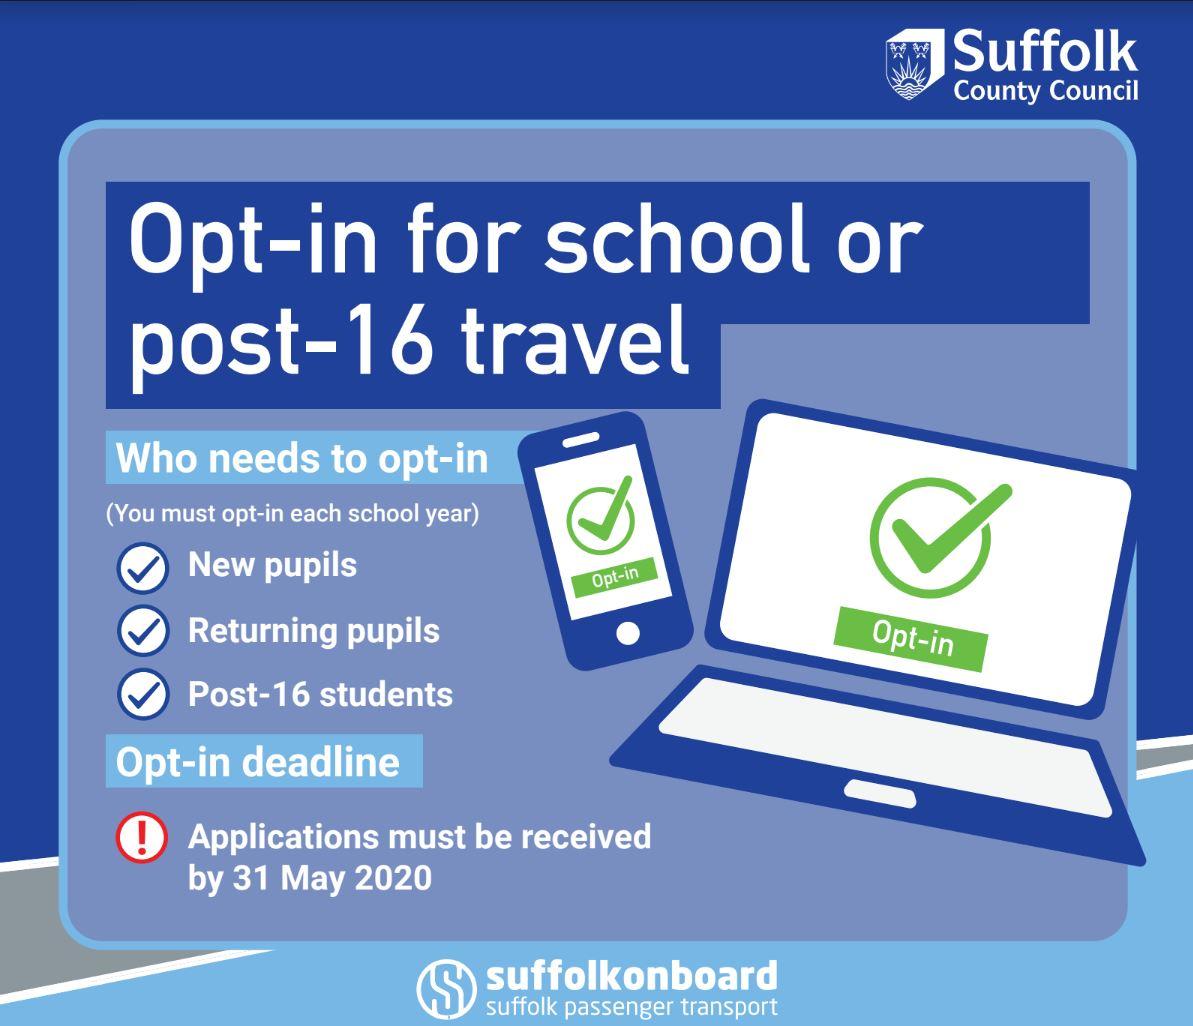 Suffolk on board